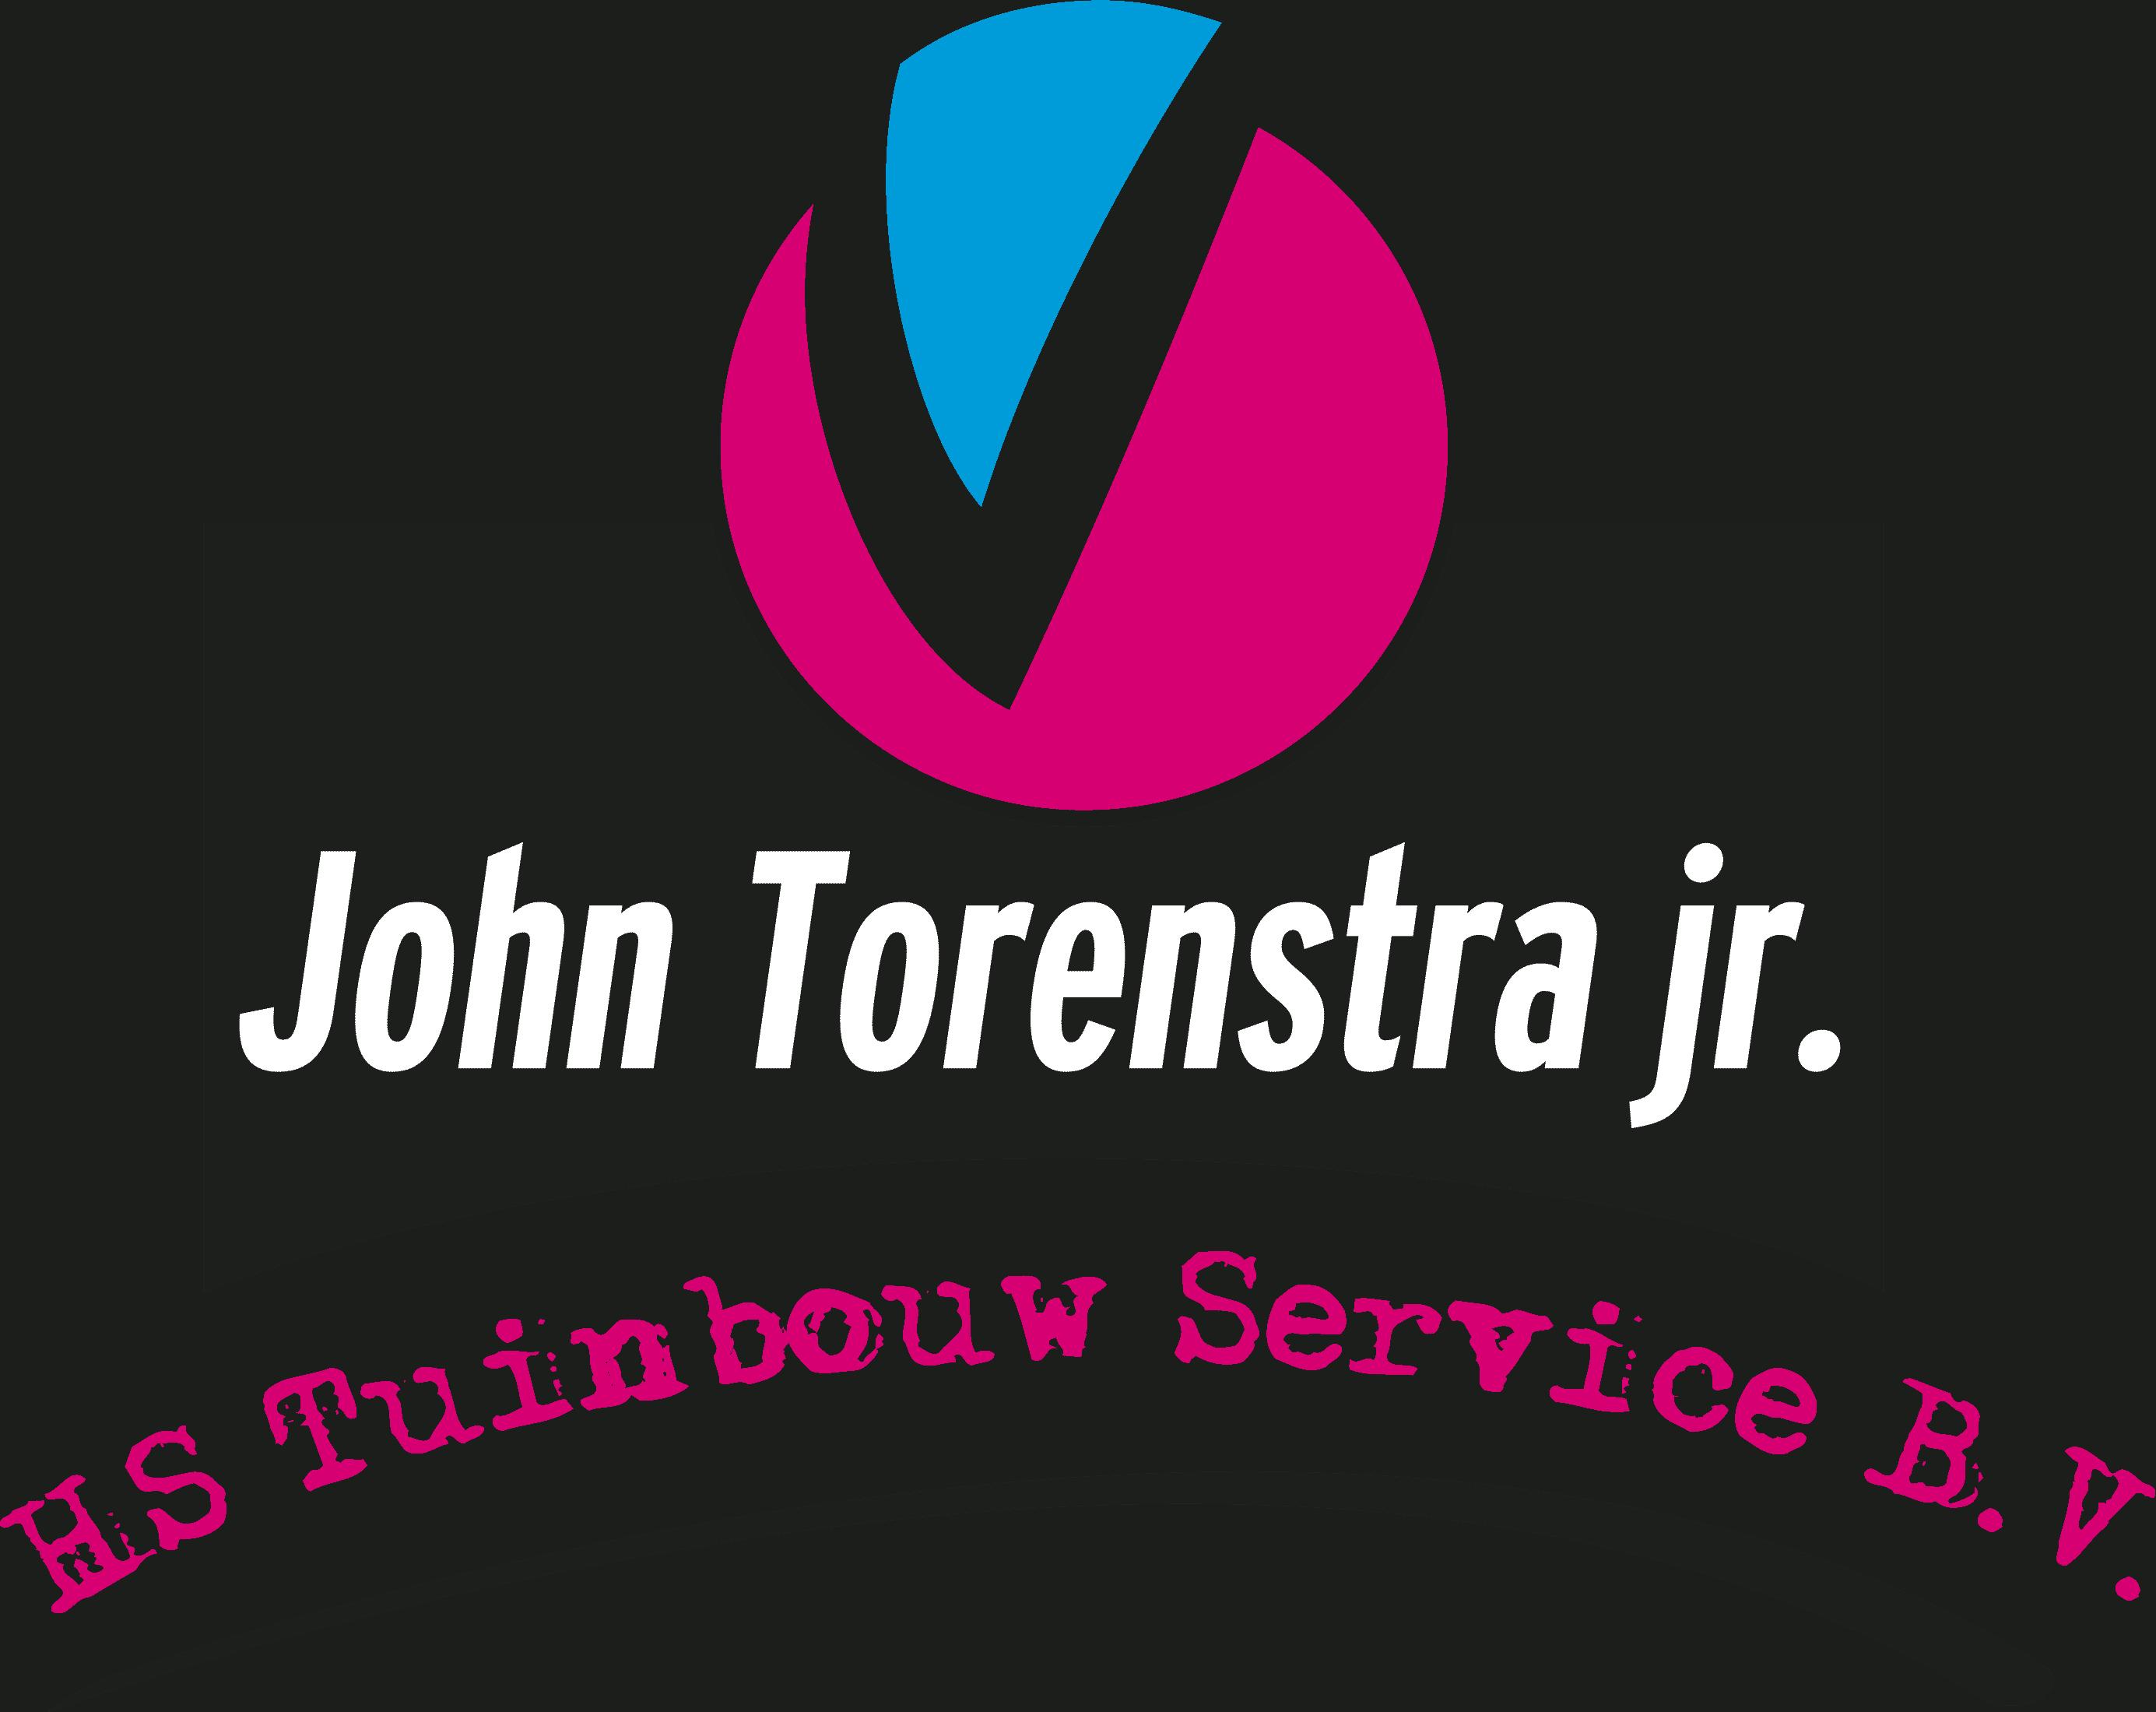 HS Tuinbouw Service_PNG-logo